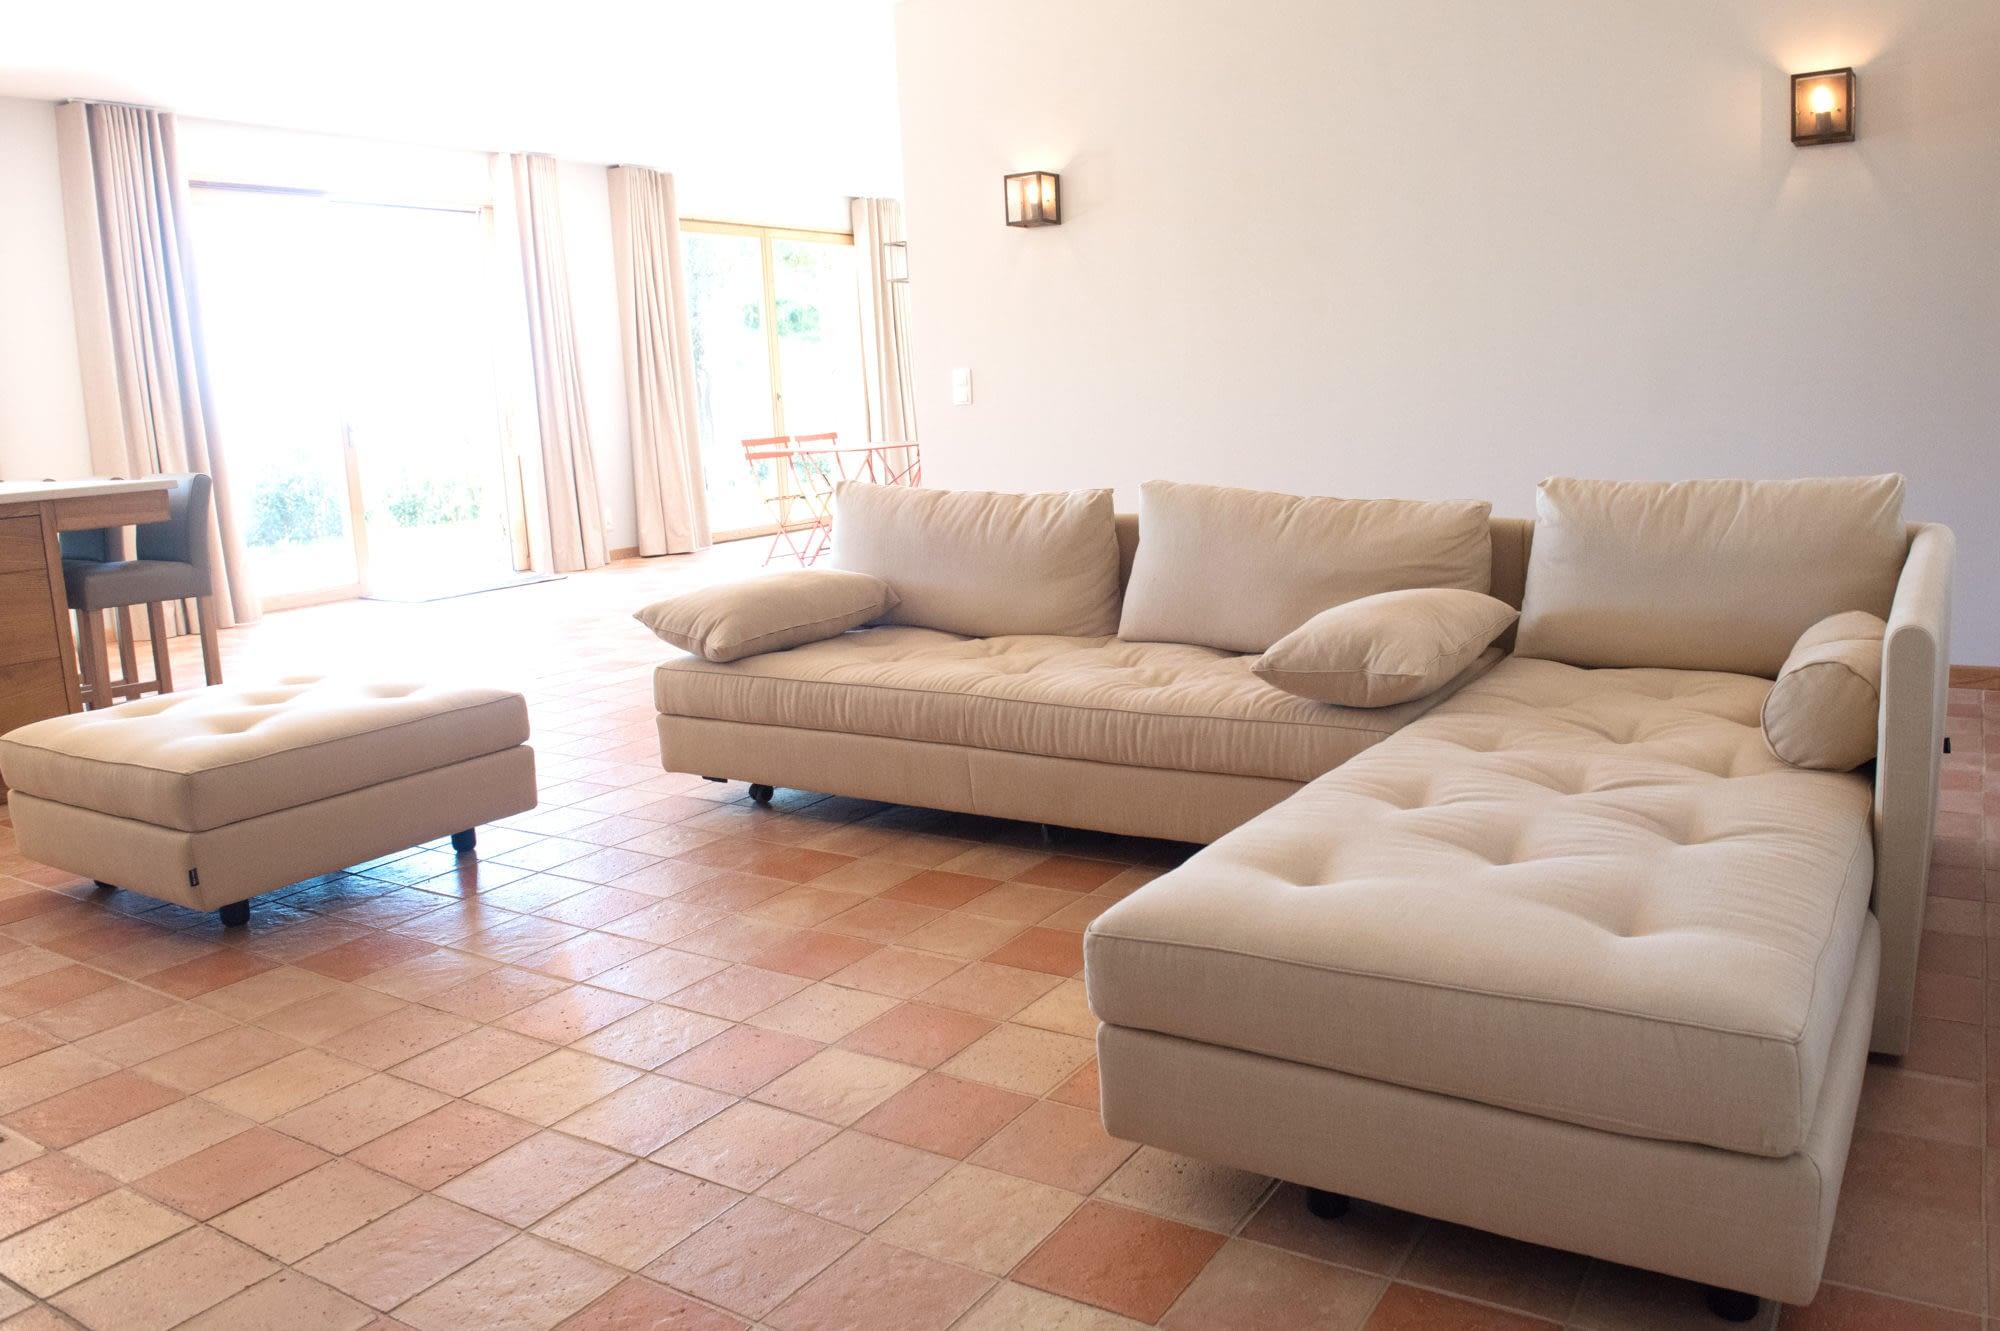 Salon dans Le grand chêne / Living room in the house Le grand chêne